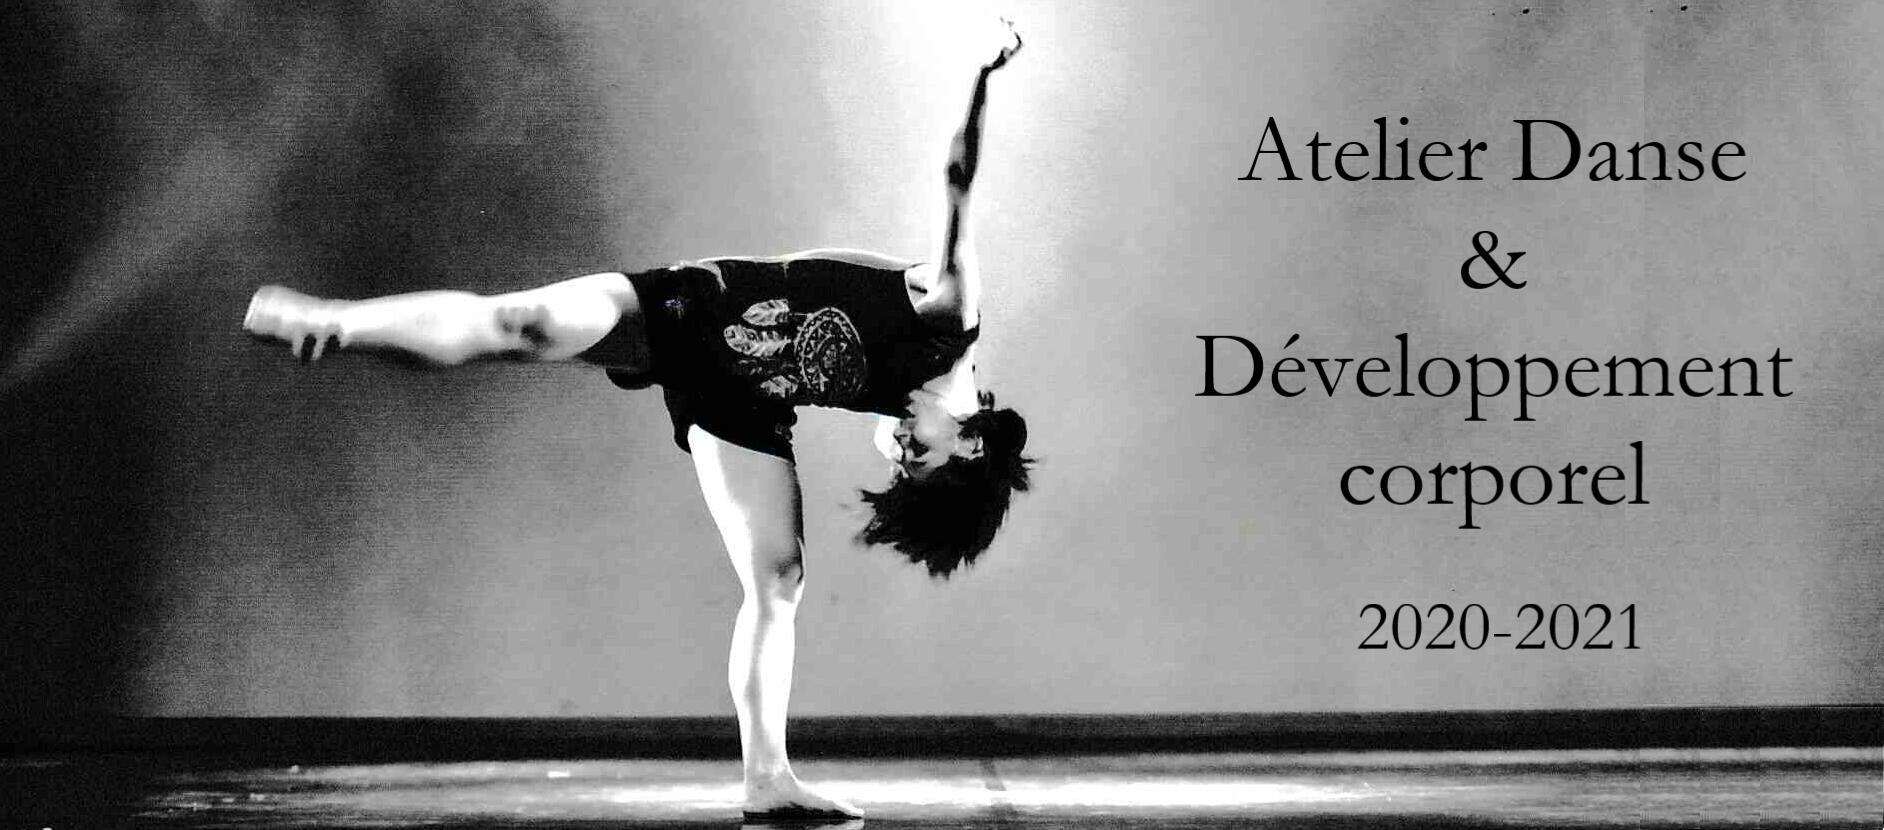 Actu : Atelier Danse & Developpement corporel